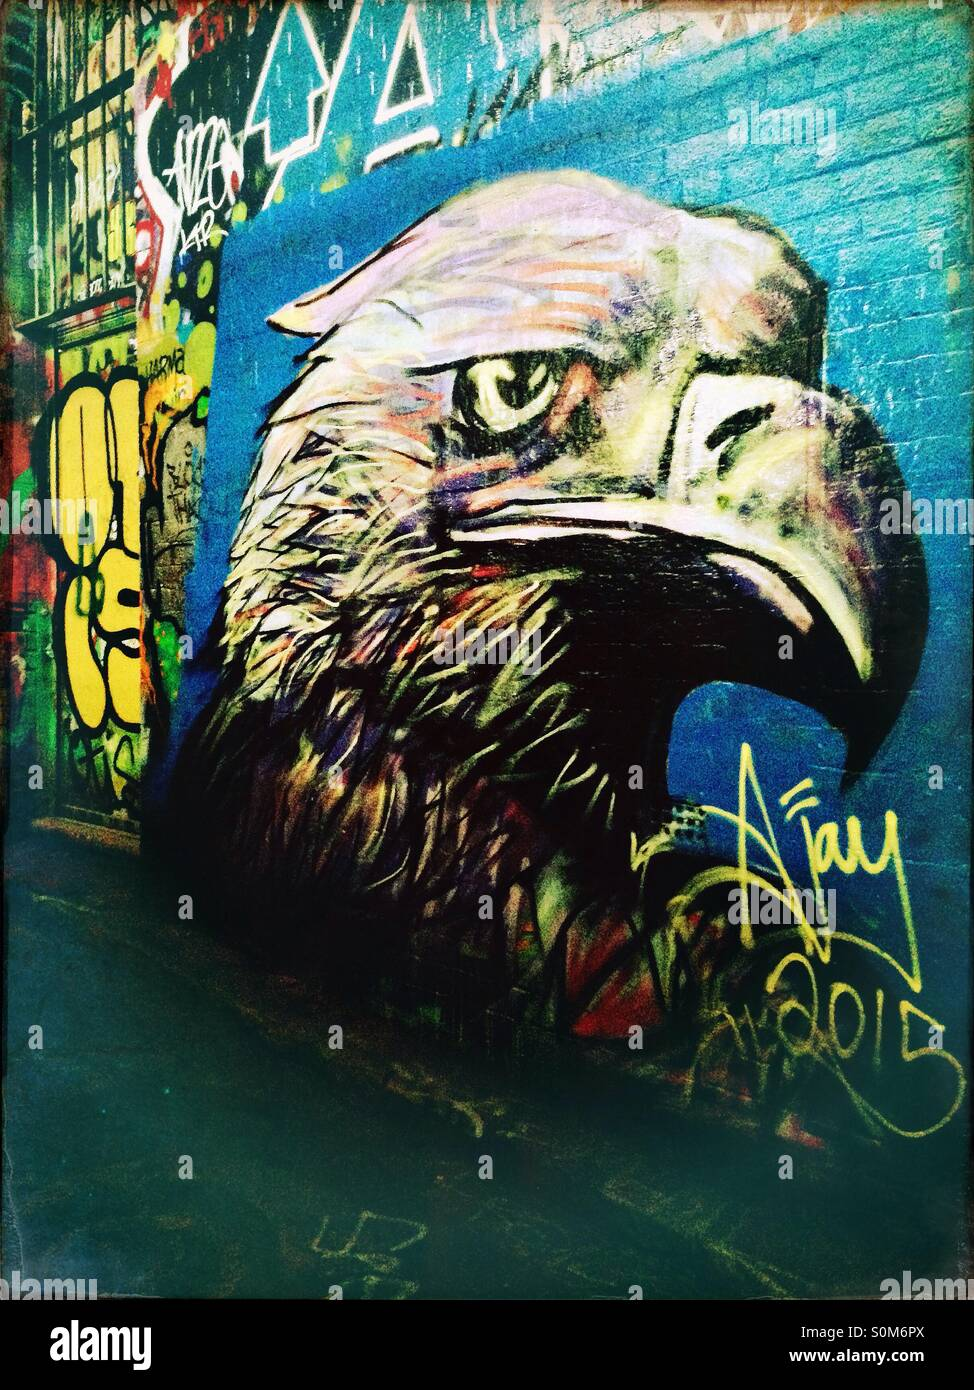 Street art of an eagle head Stock Photo